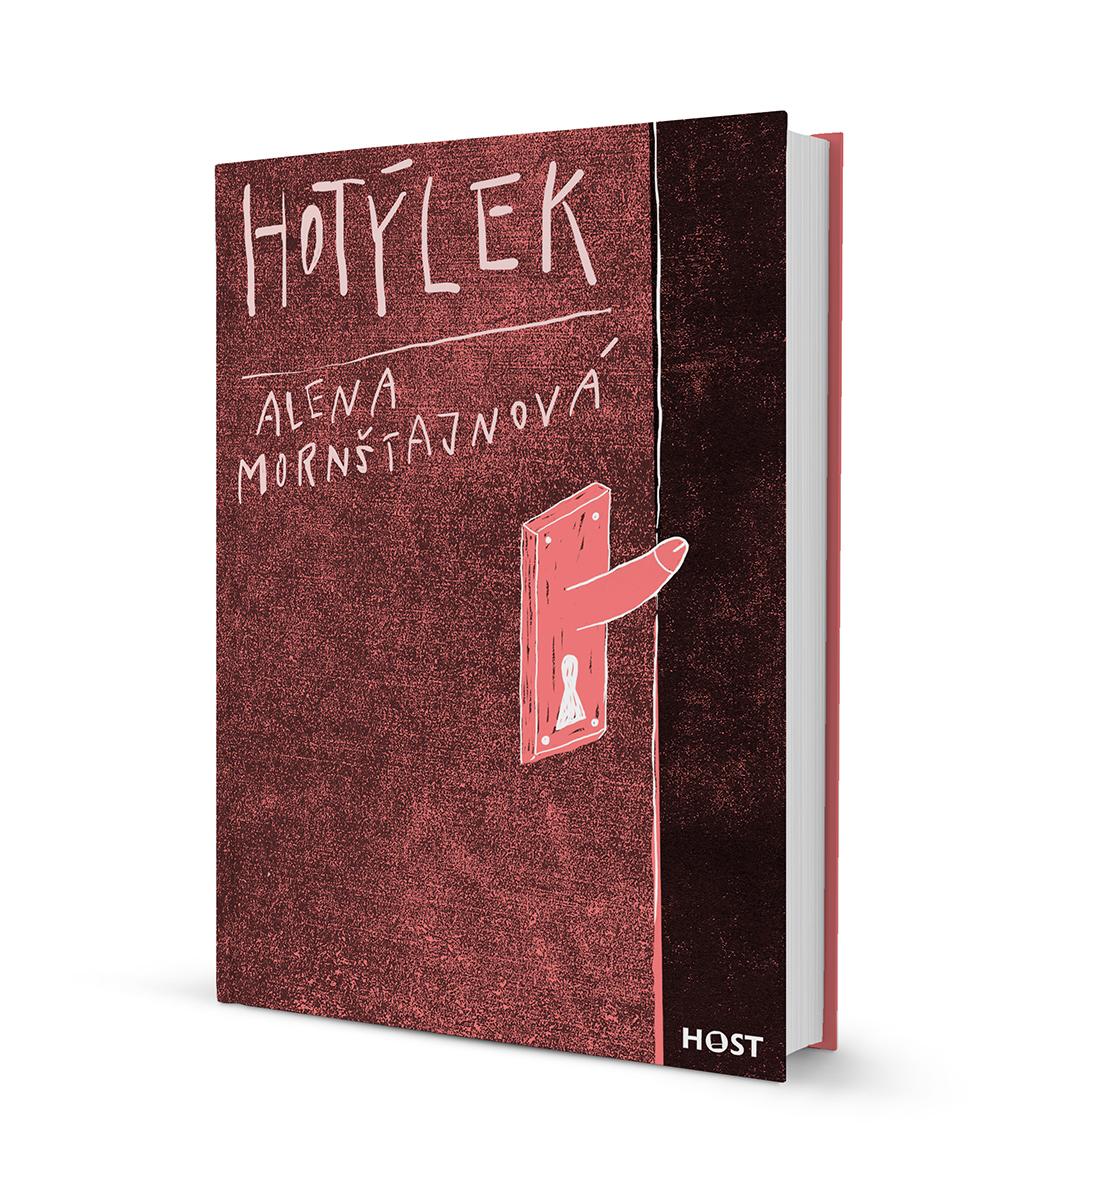 Book cover Hotylek